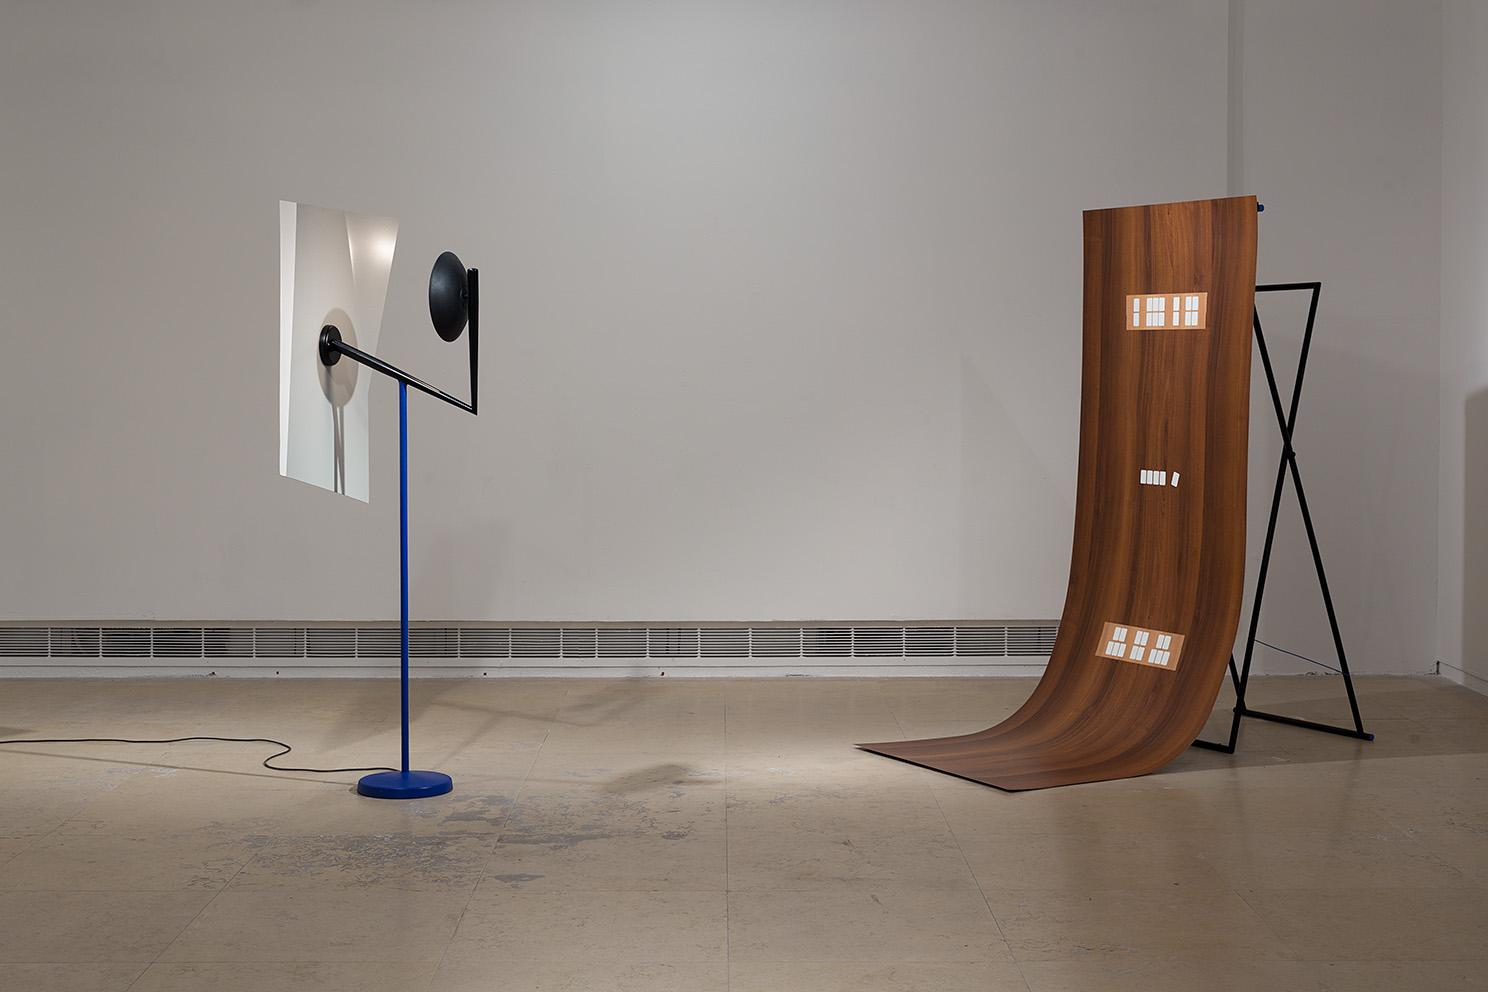 Yael Efrati, Eye of the Sea, Exhibition at the Center for Contemporary Art, Tel Aviv, 17.03.2016 – 14.05.2016 © Elad Sarig